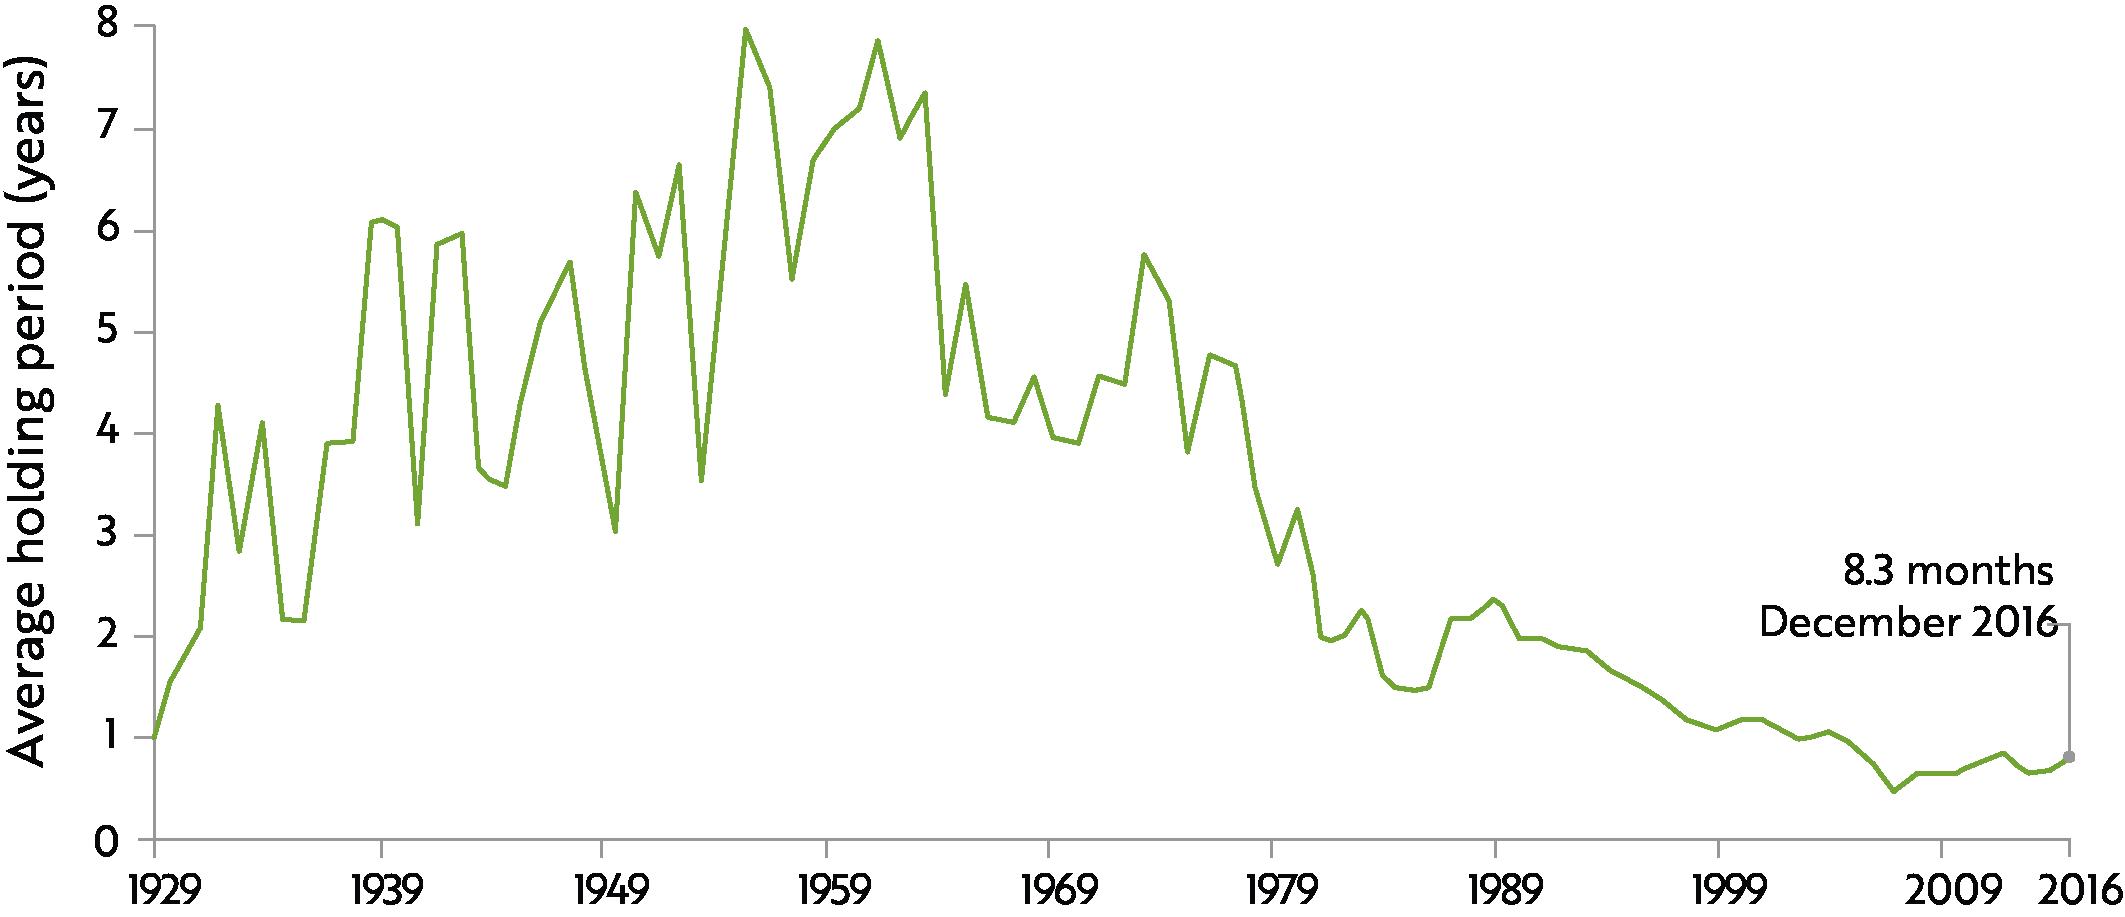 NYSE average holding periods, 1929 - 2016